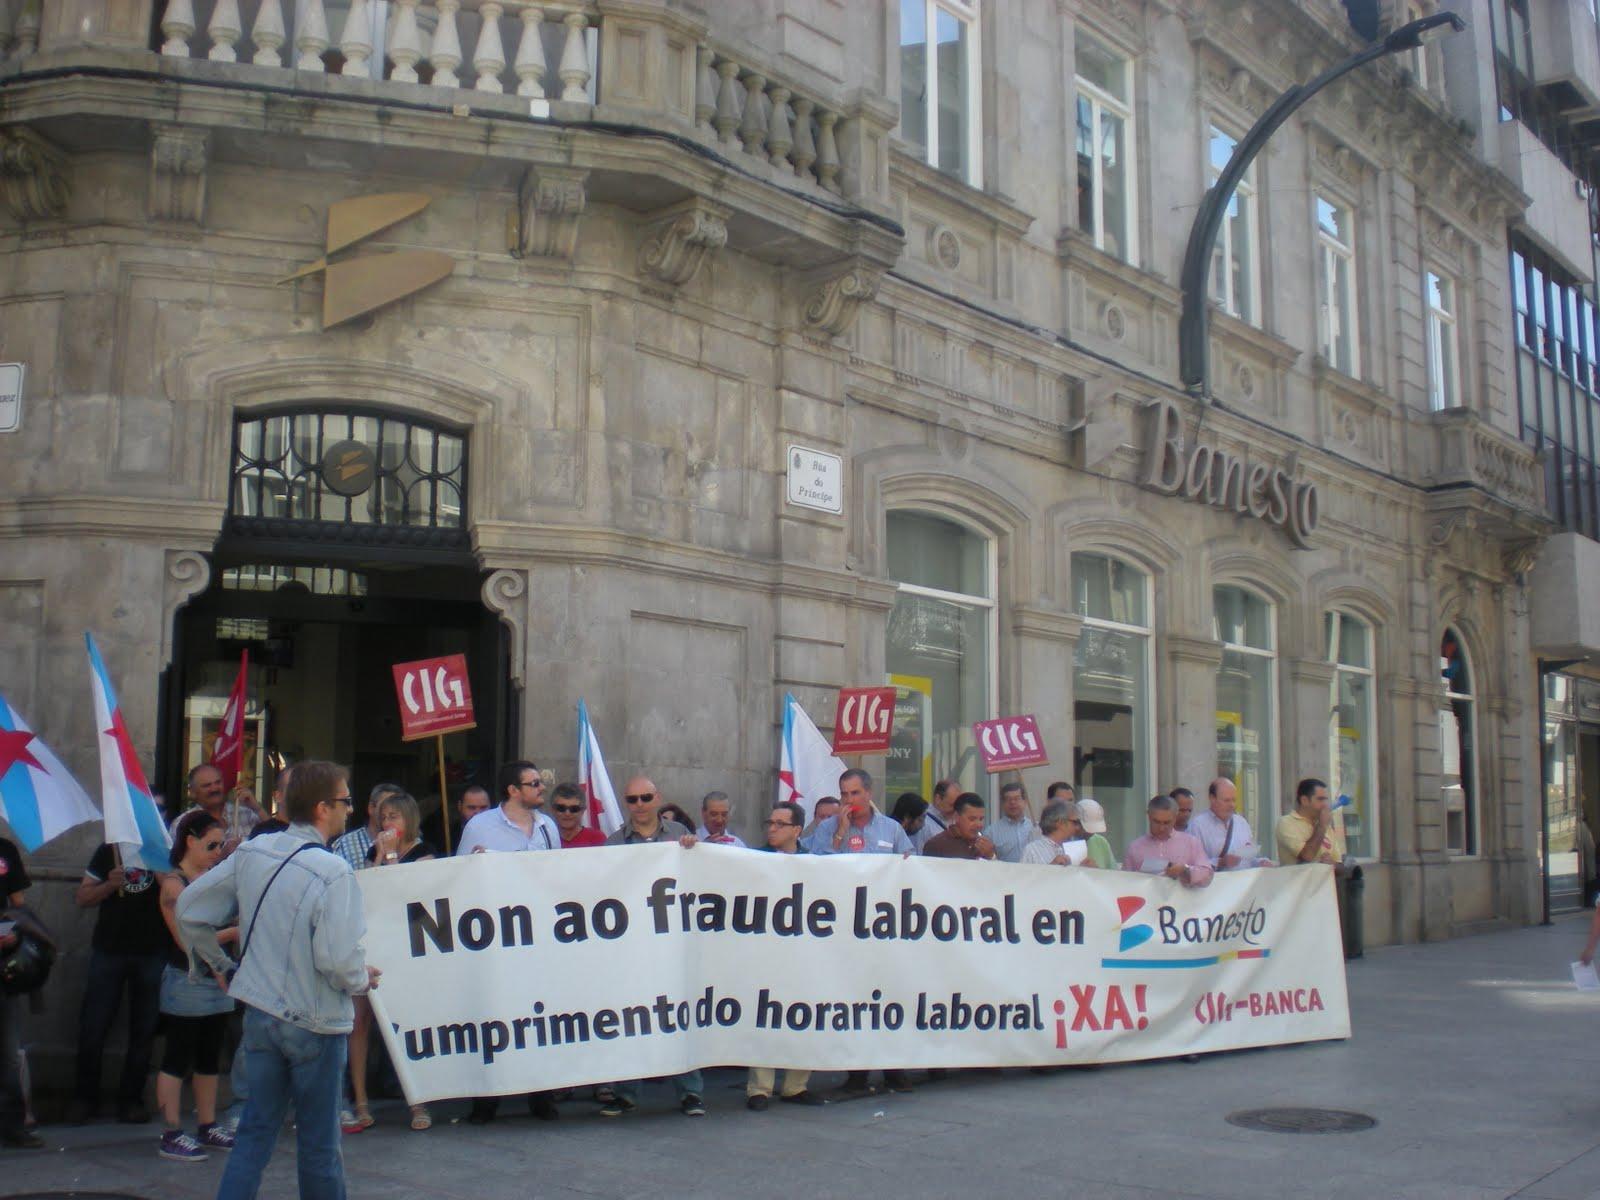 Secci n sindical cig santander 2010 06 for Oficinas bbva vigo